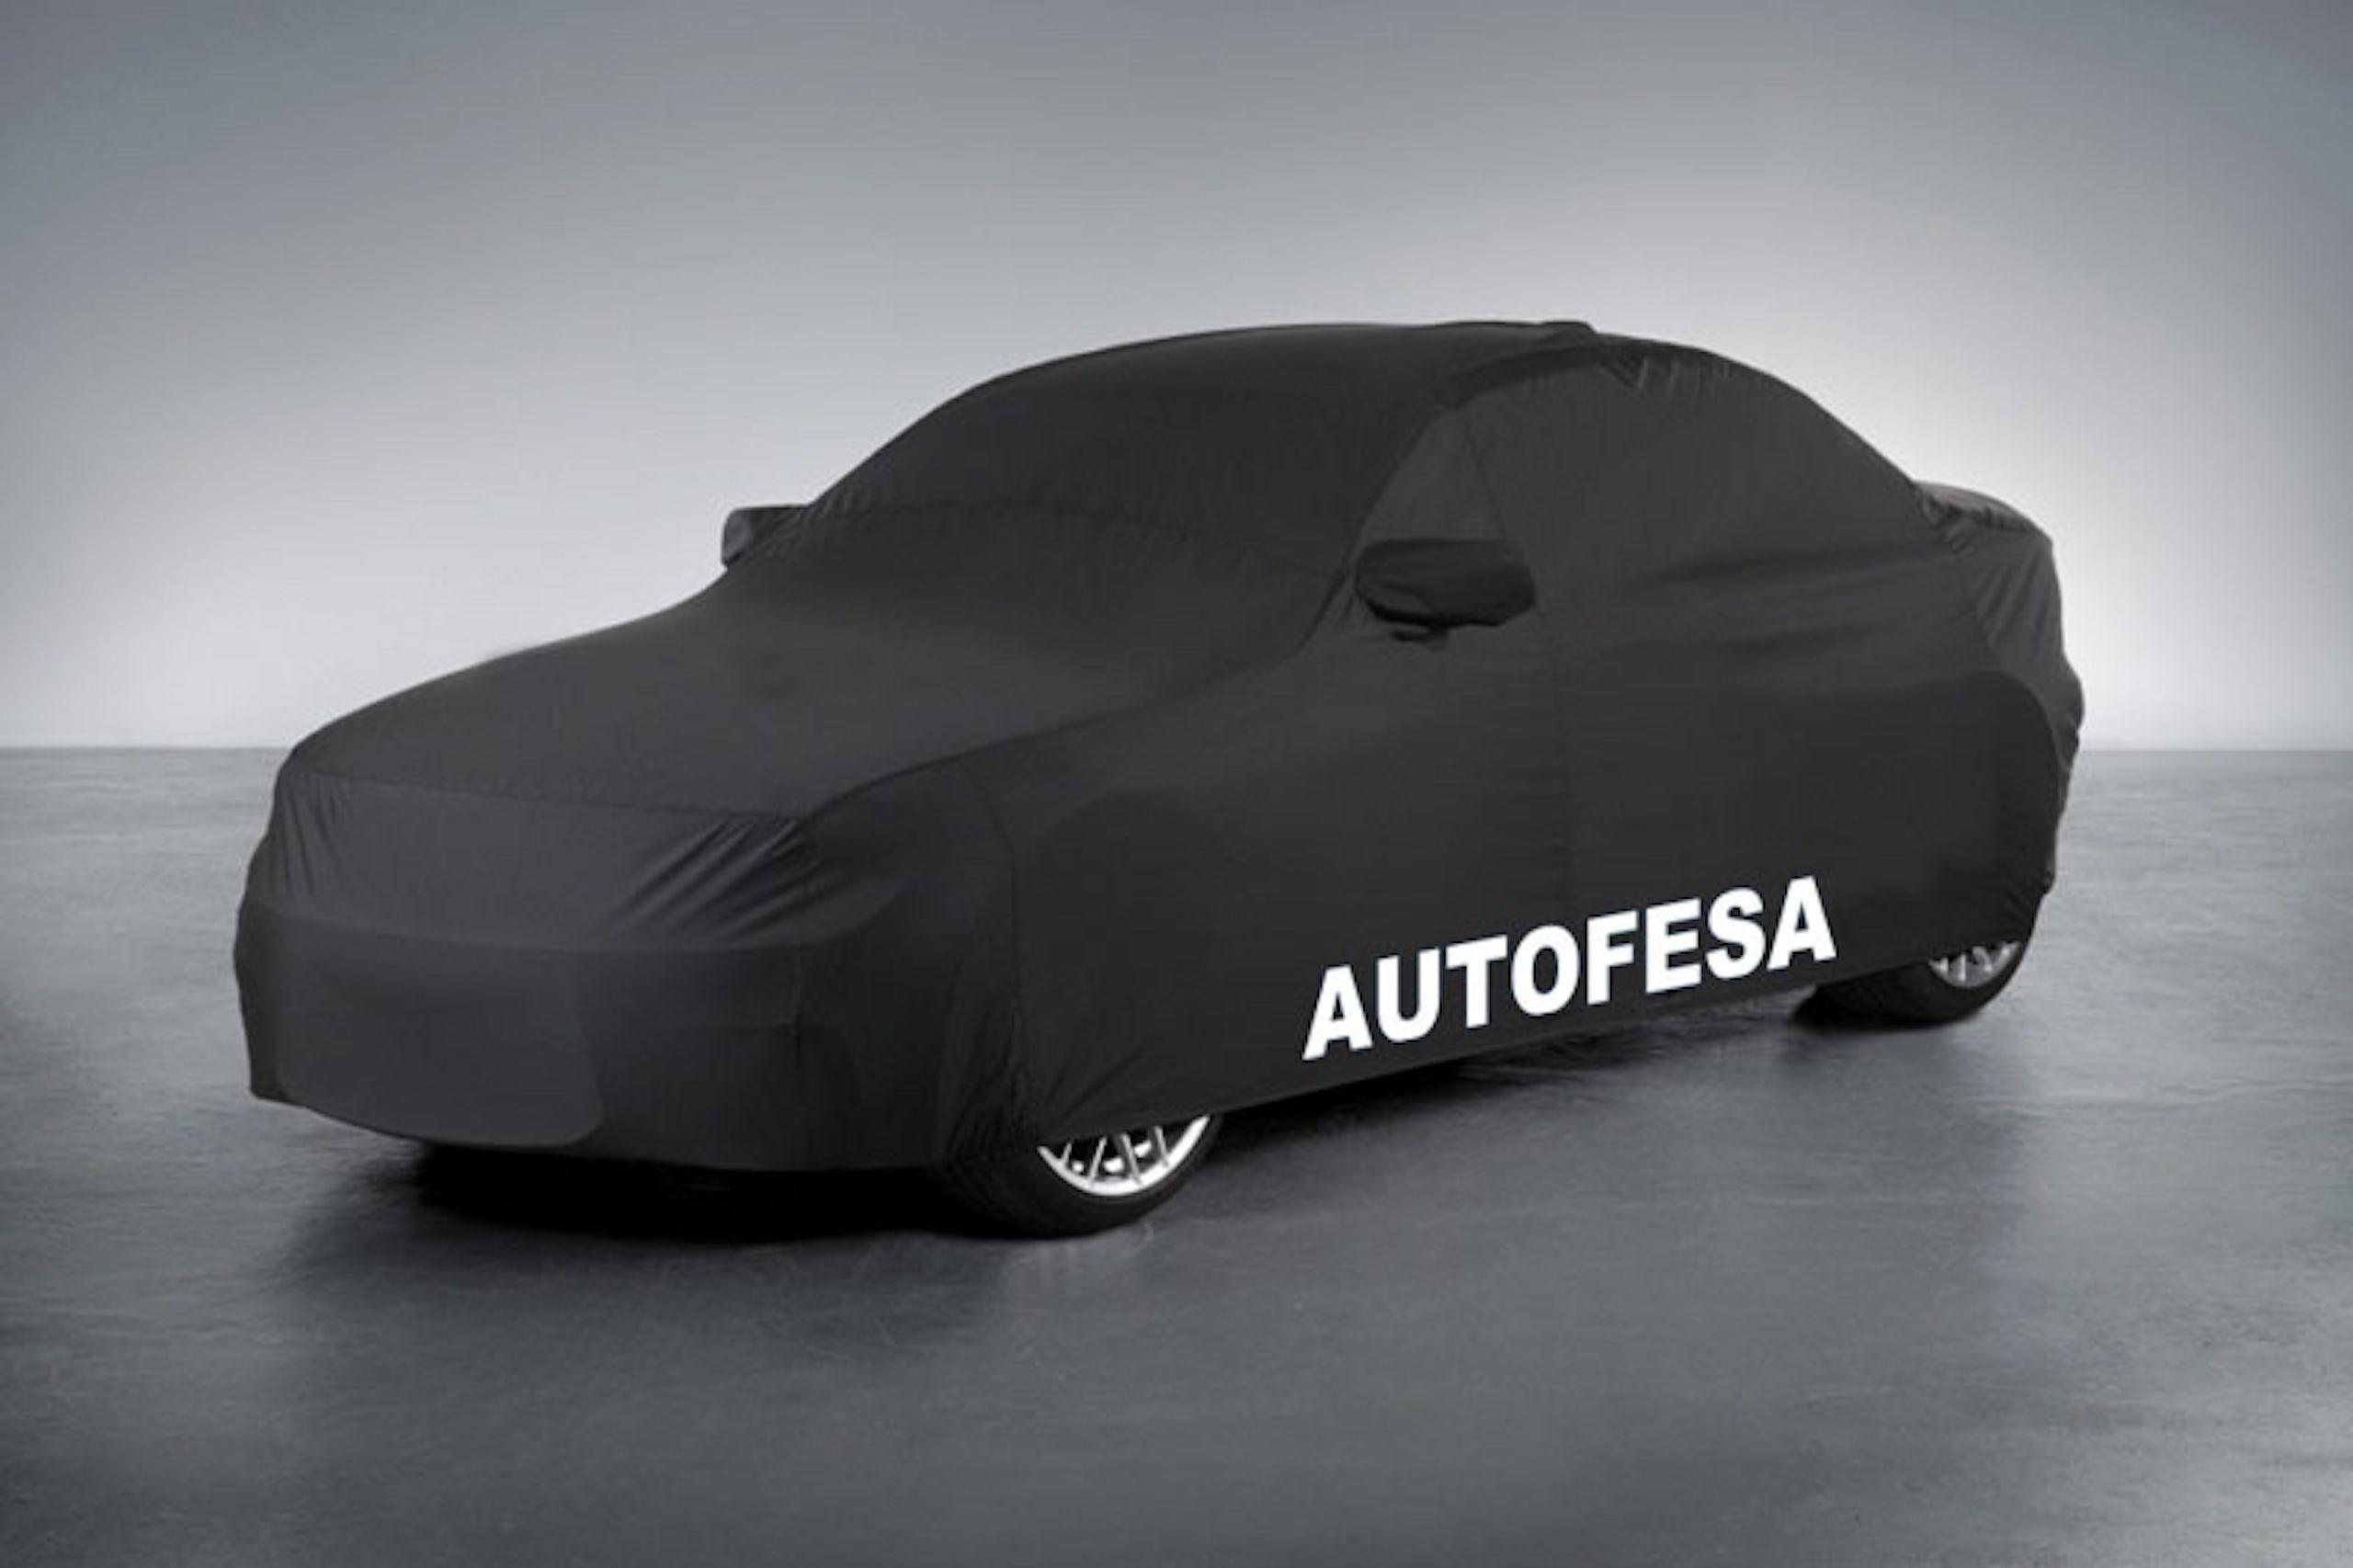 Lexus Nx 300h 300h 2.5 197cv Luxury 4WD 5p CVT Auto - Foto 20